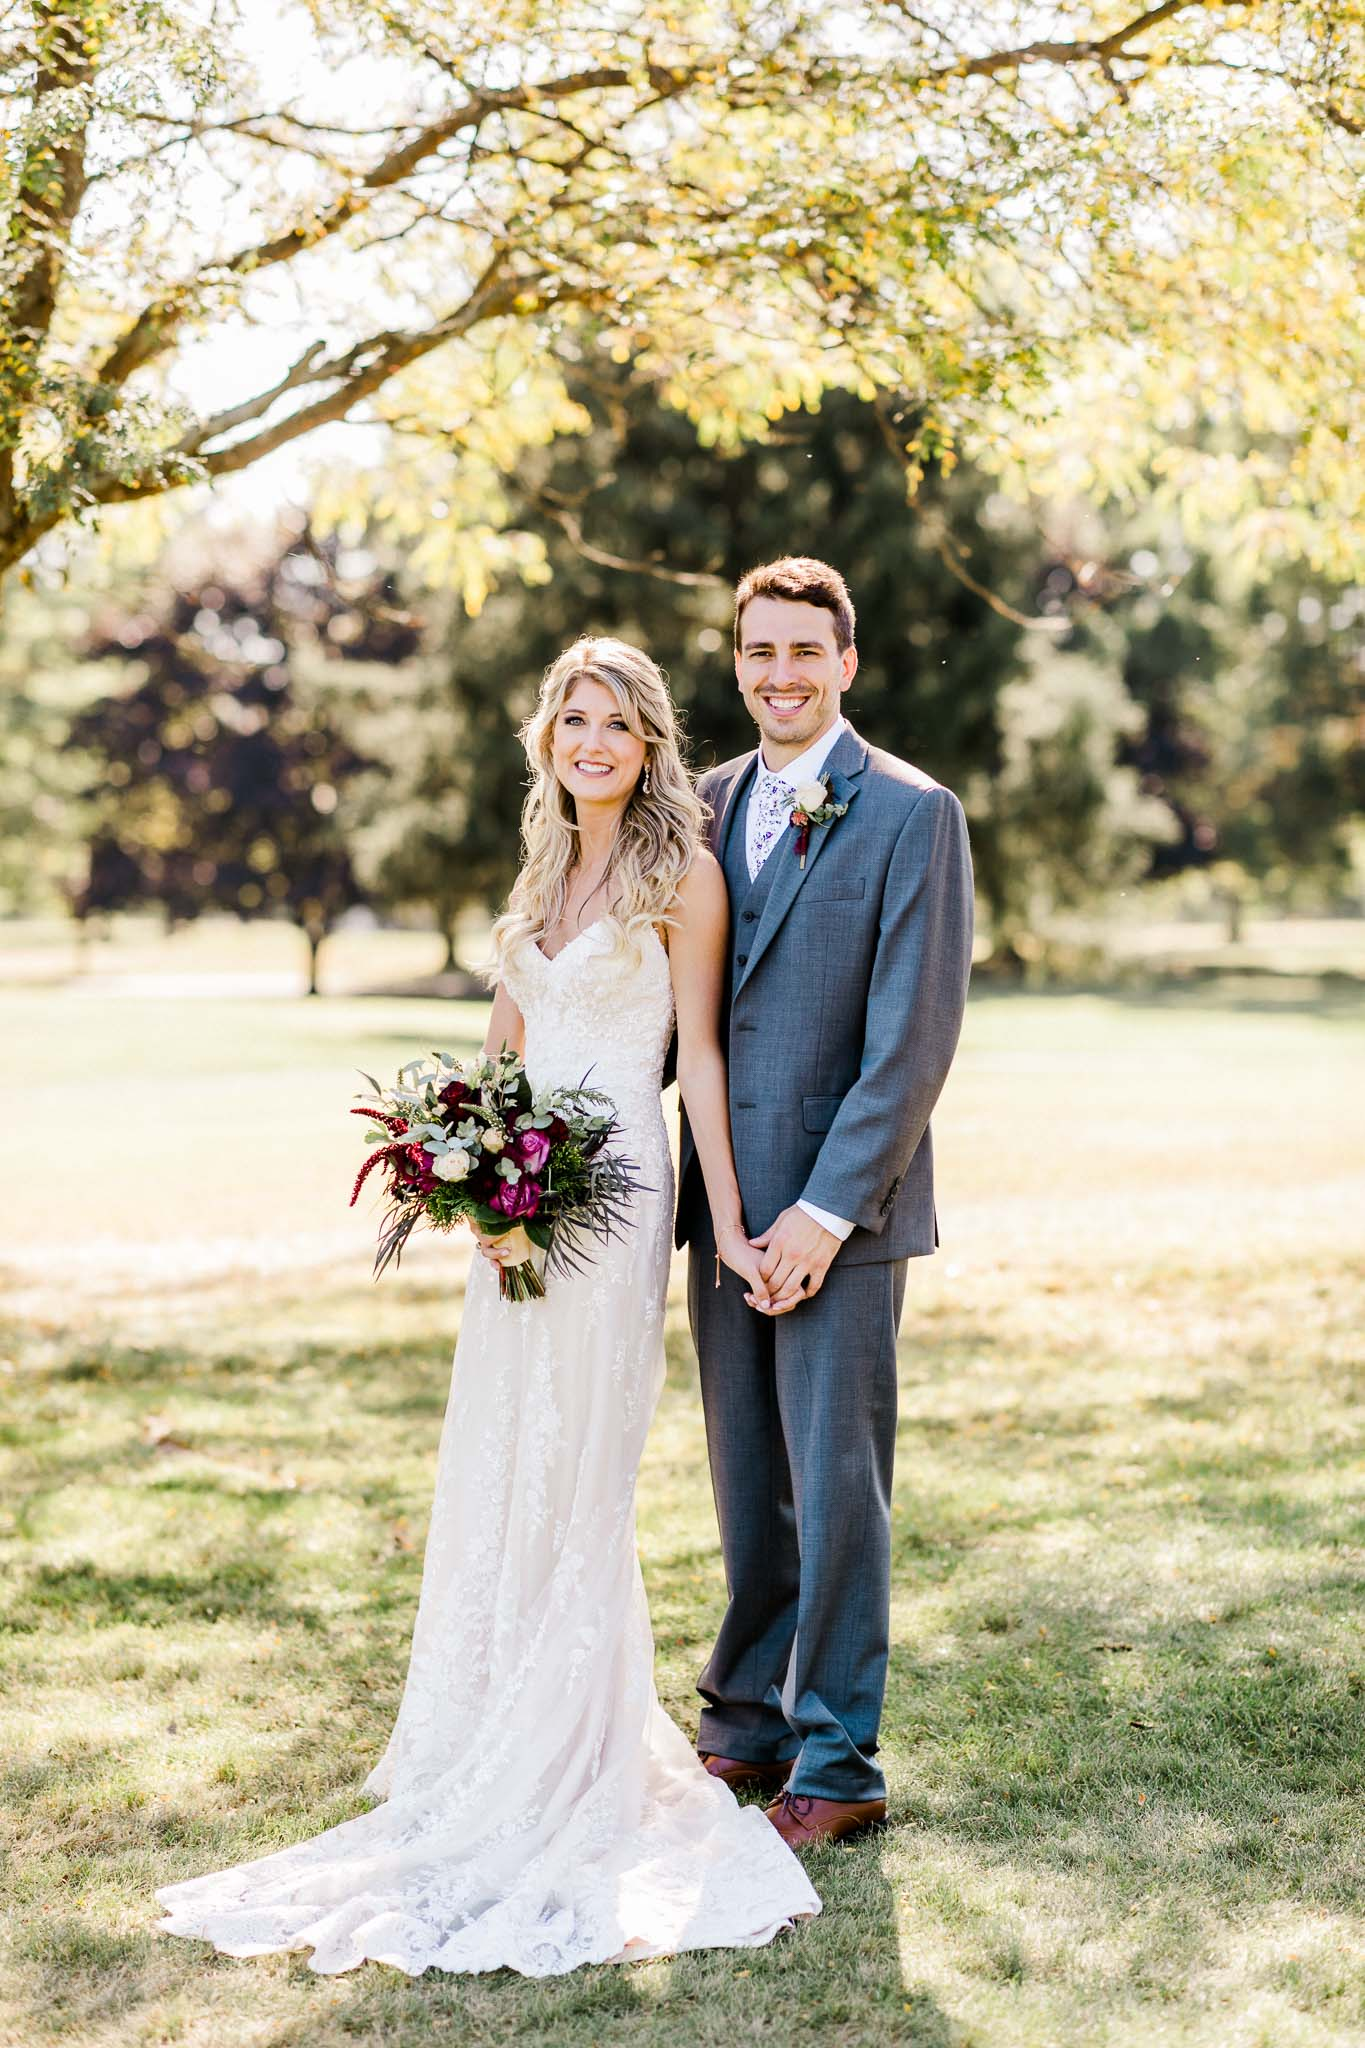 Frosty-Valley-September-Wedding-7447.jpg